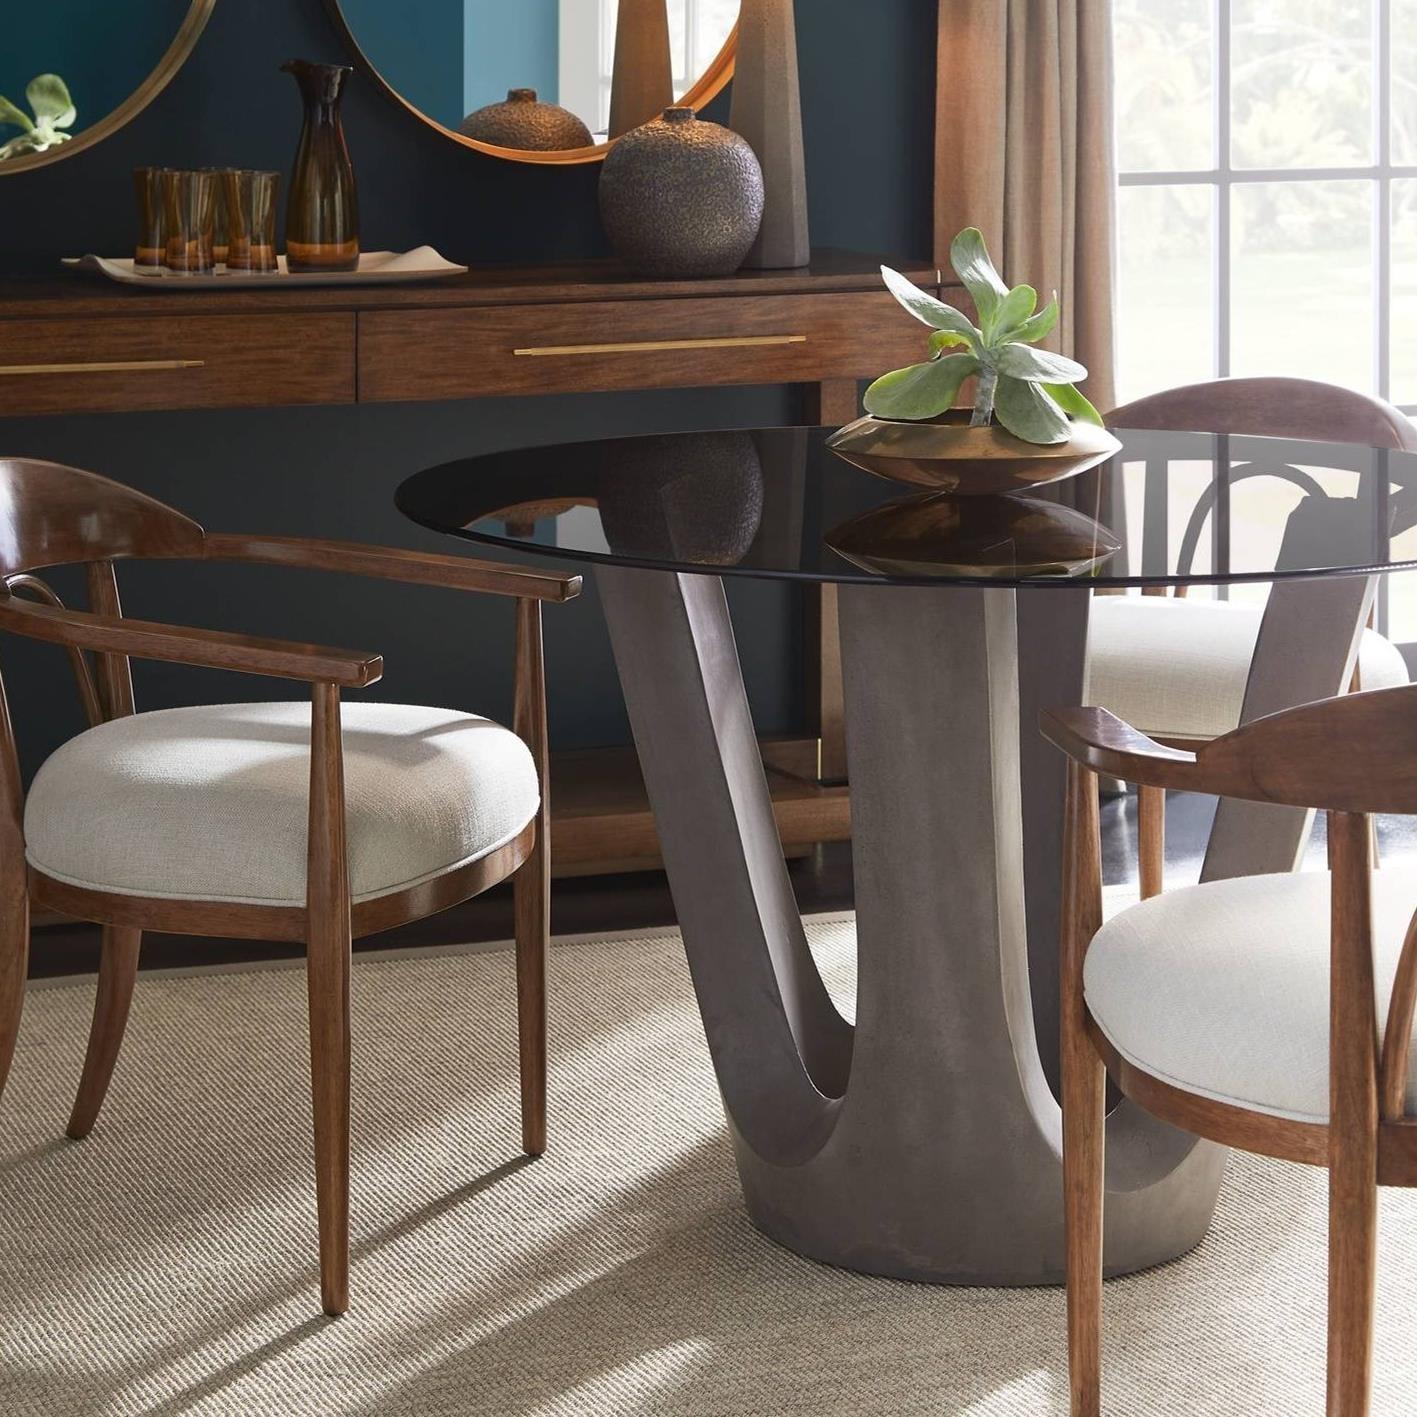 Stanley Furniture Panavista 5 Piece 48 Glass Top Dining Table Set